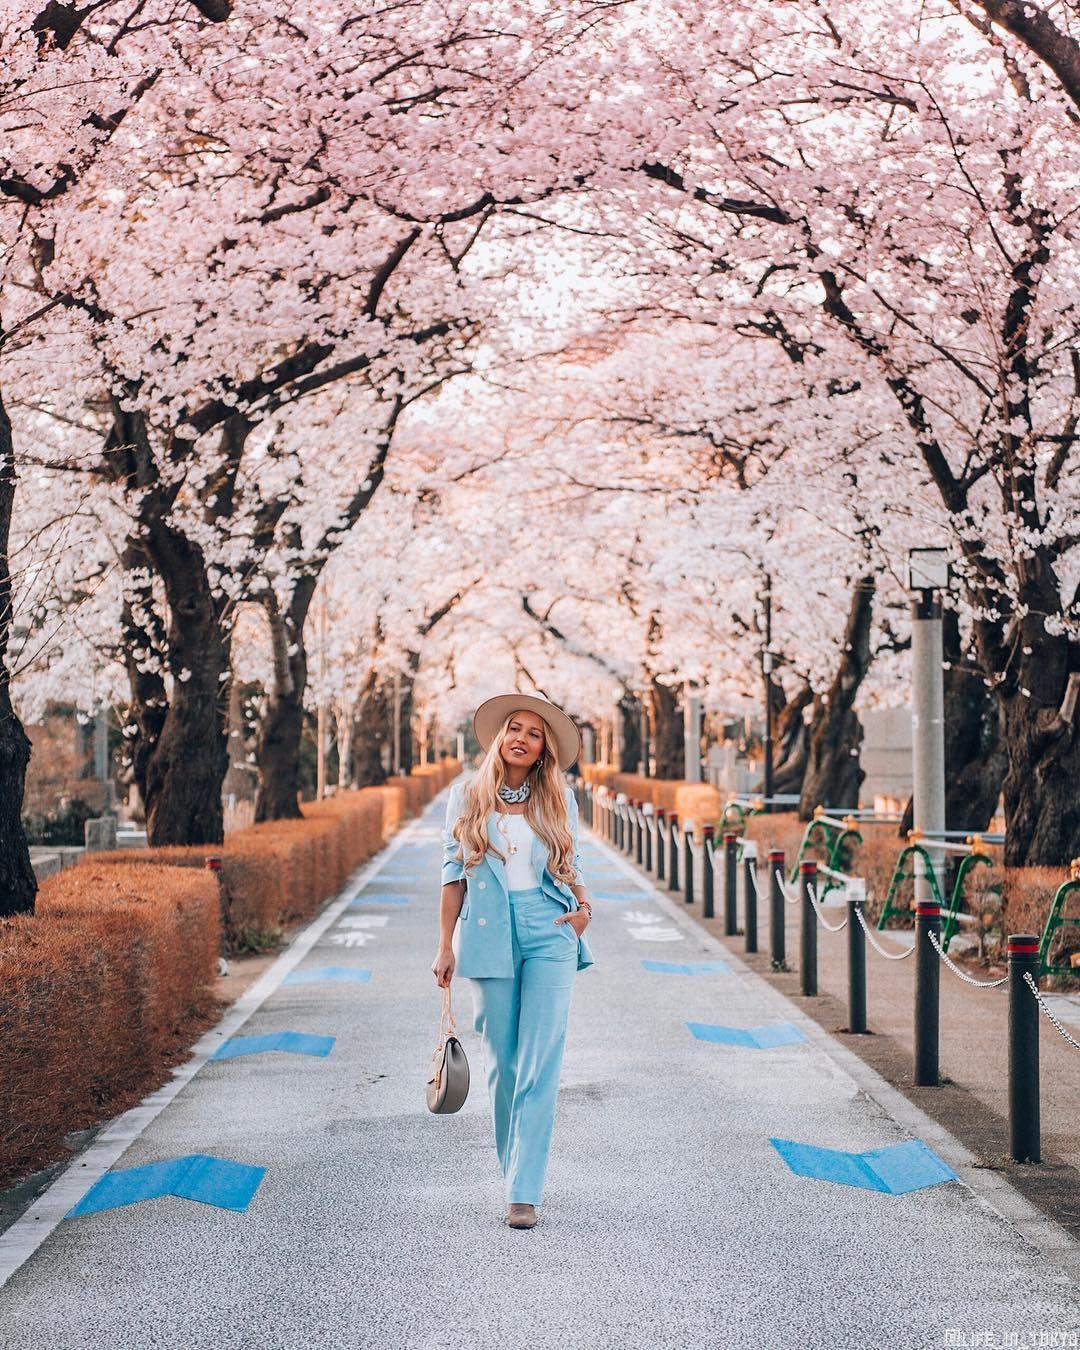 Pin By Hong Ha On Japan Japan Photography Japan Travel Spring Outfits Japan